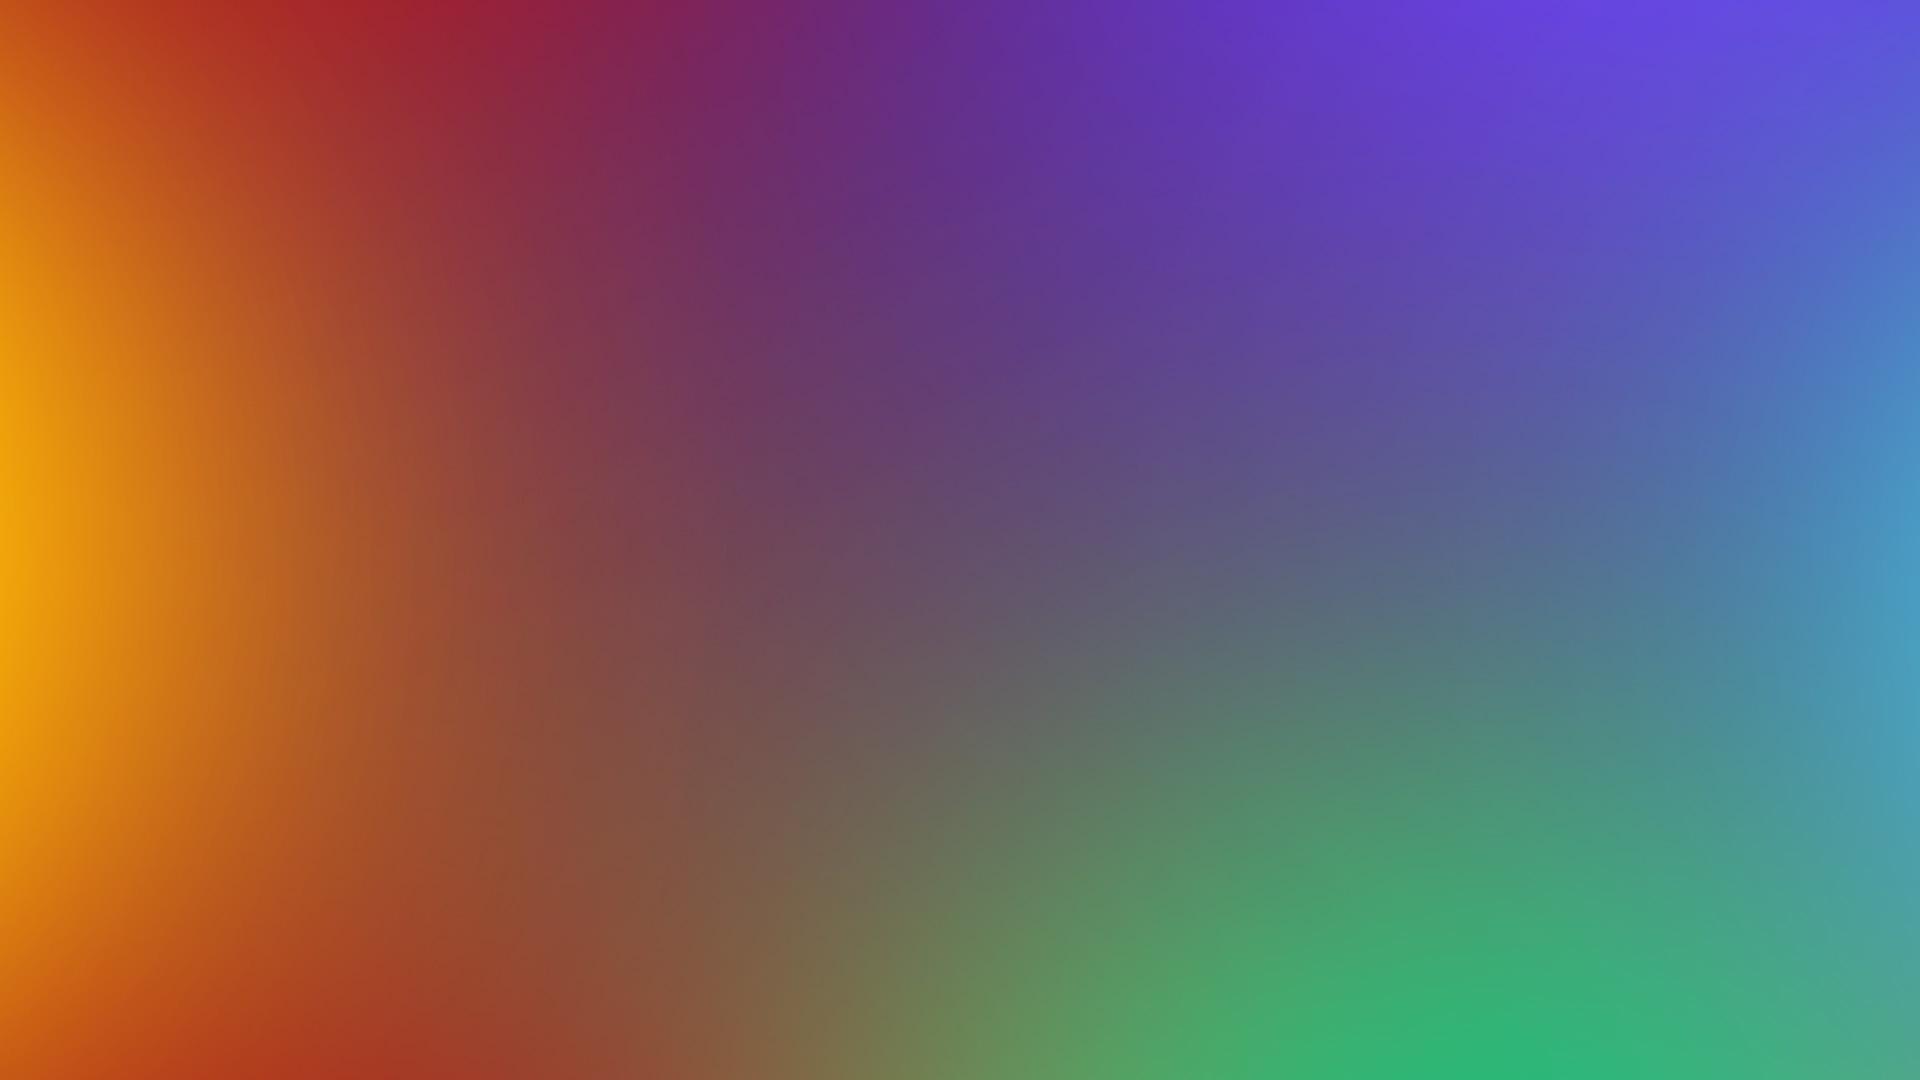 Wallpaper Colorful Blurred Simple Qqu